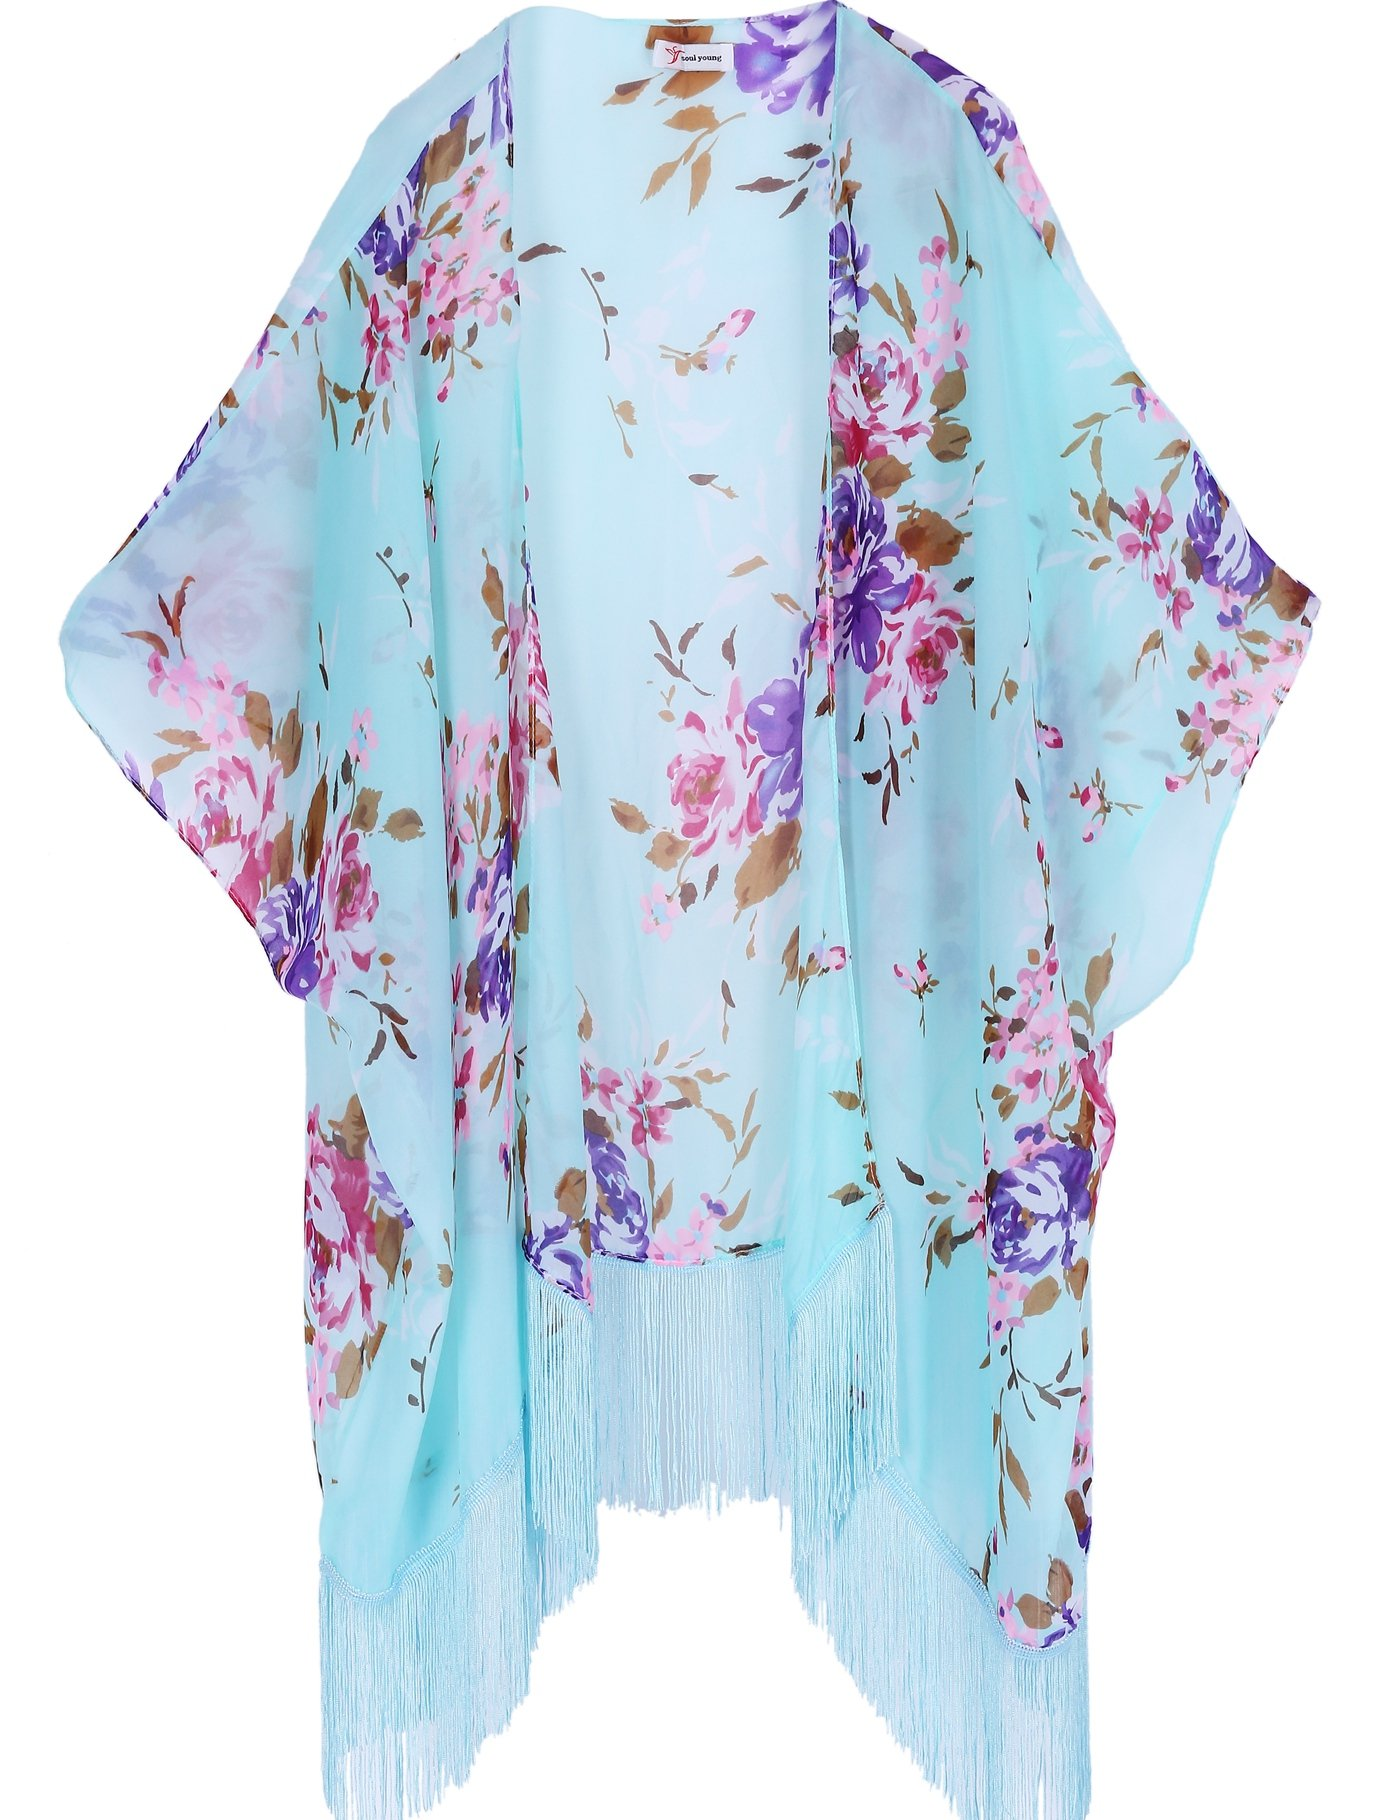 Women's Floral Kimono Cover Up - Lightweight Leopard Chiffon Beachwear for Bikini,Cardigan and Swimwear (One Size, Light Blue)